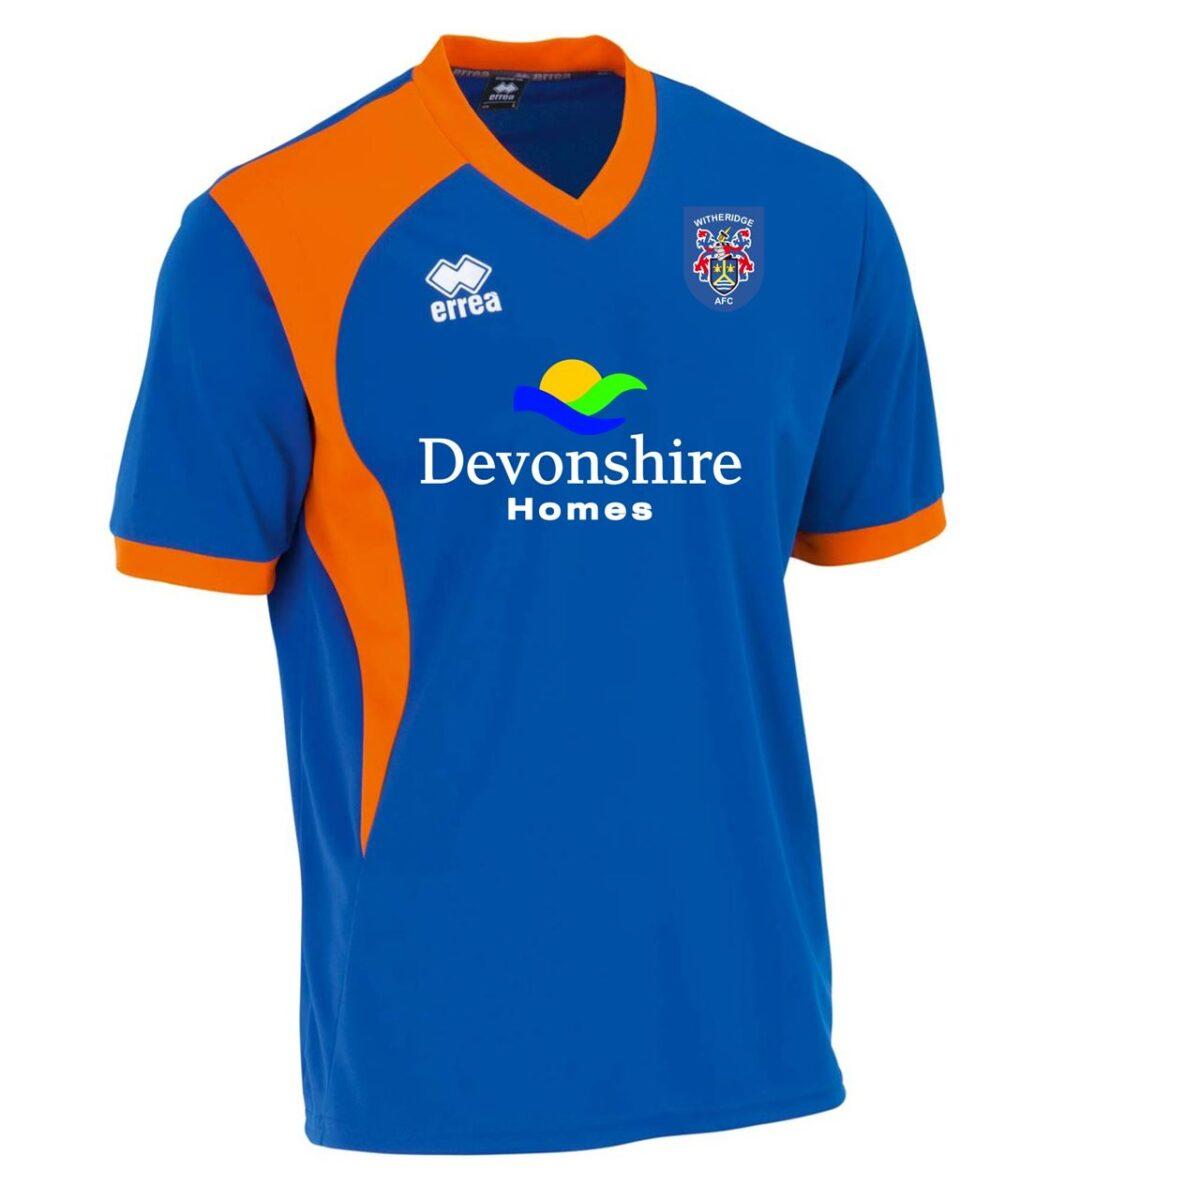 Witheridge Football Club Replica Shirt